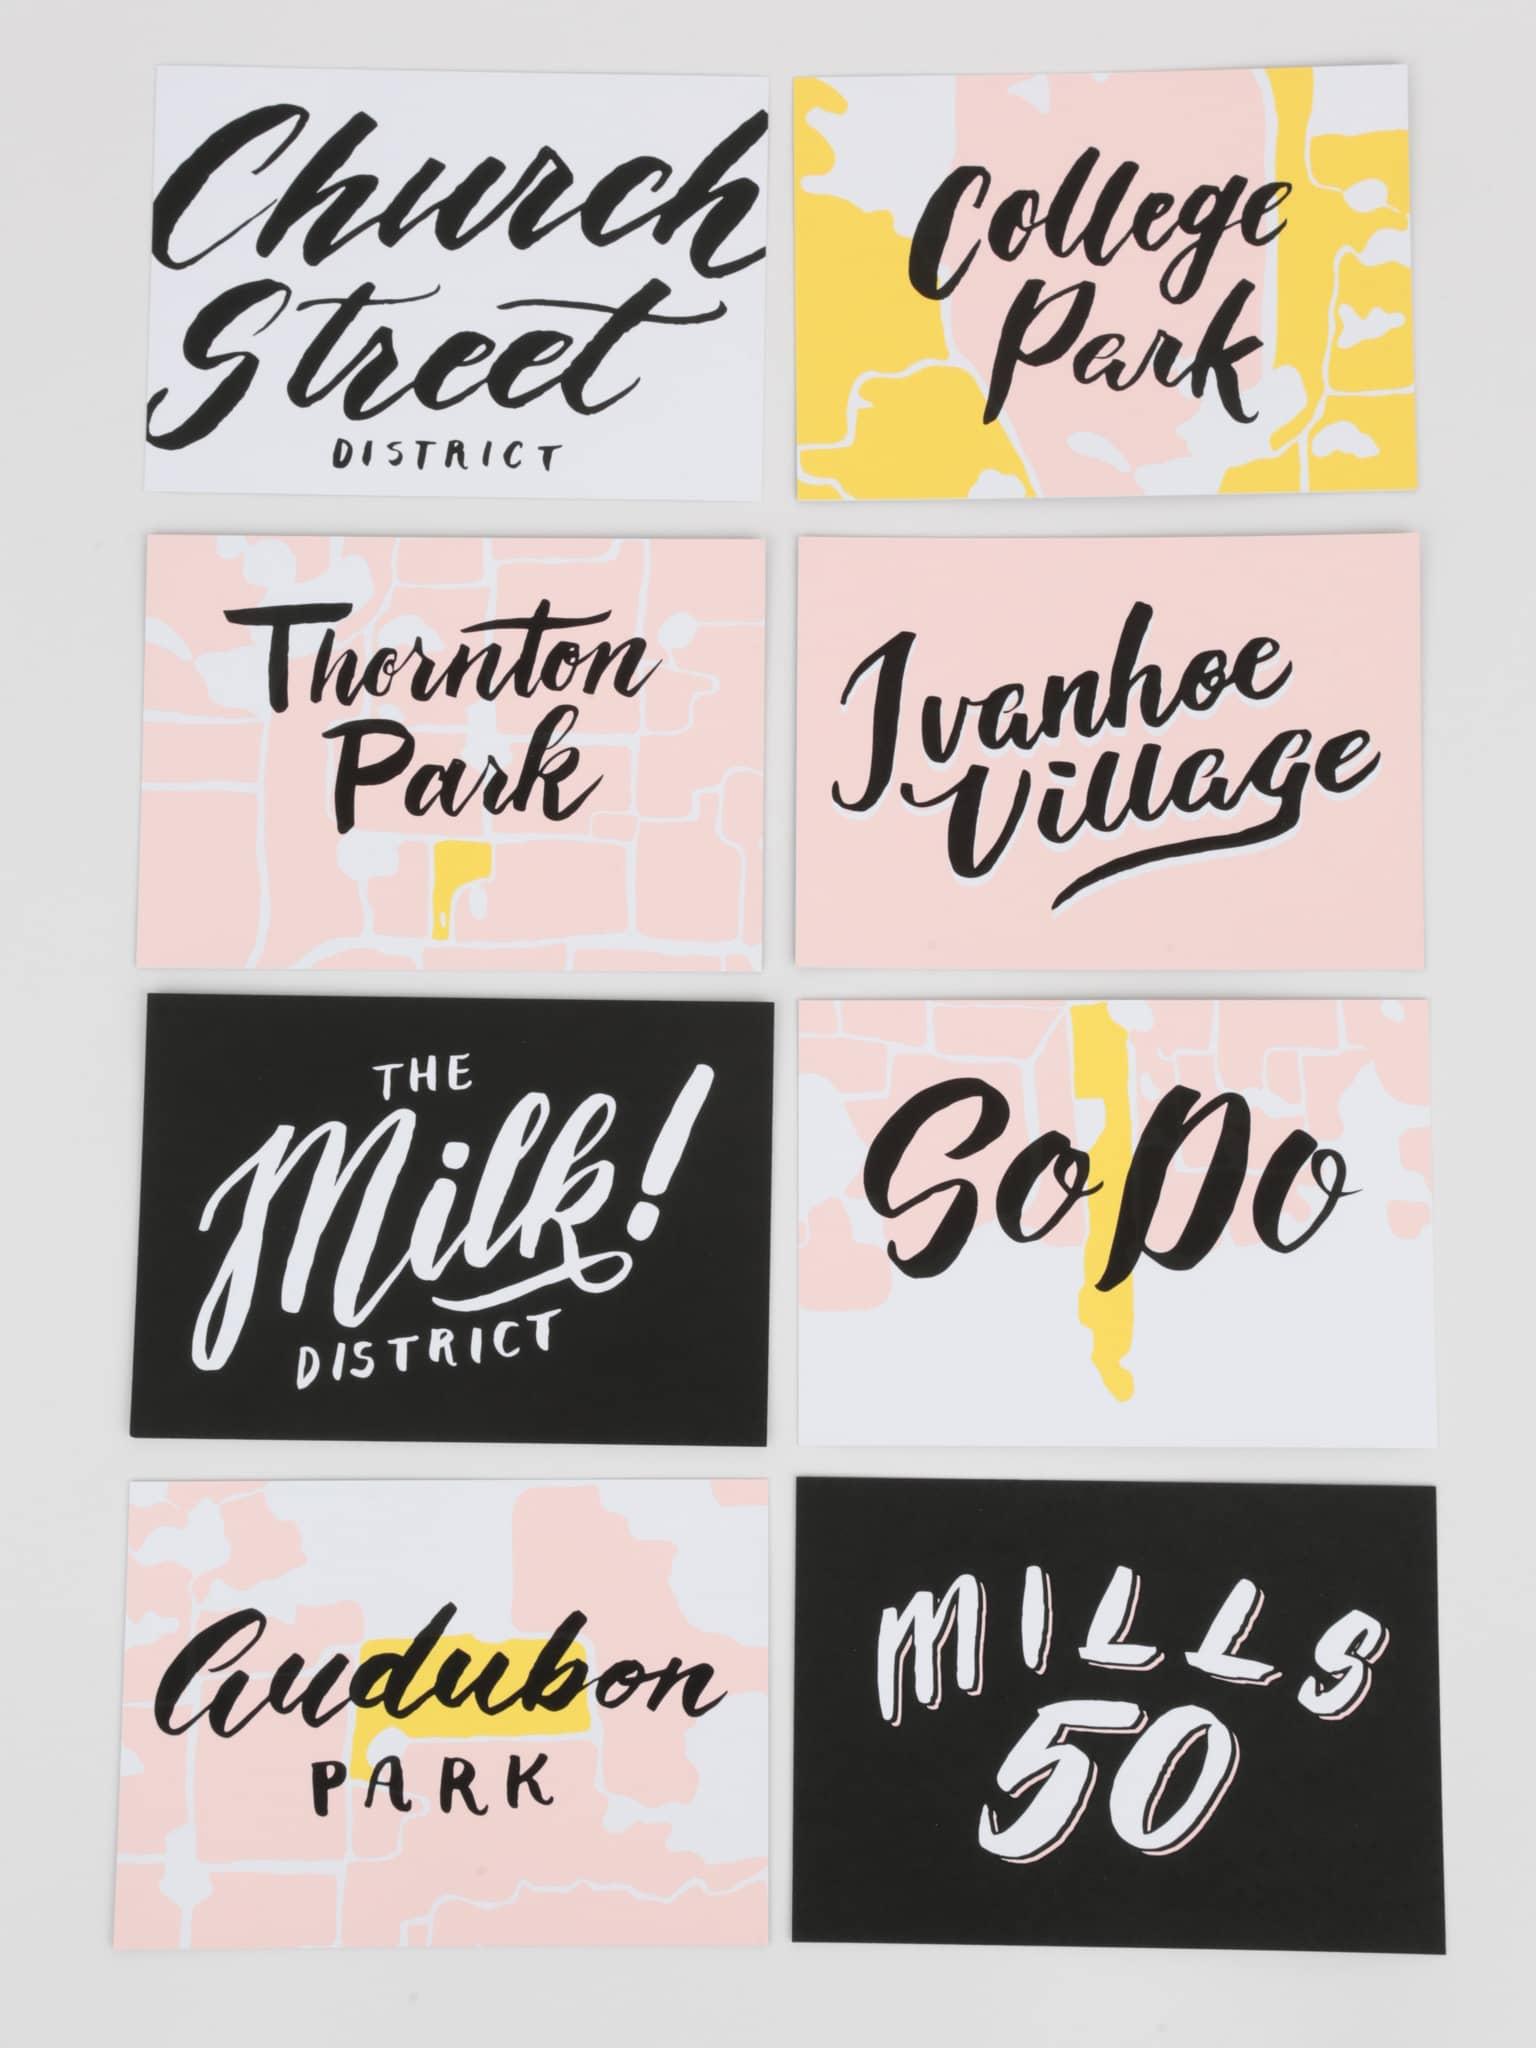 Milk District, Church Street, College Park, Thornton Park, SoDo, Mills 50, Ivanhoe Village, Audubon Park hand lettered postcards by Hillery Powers